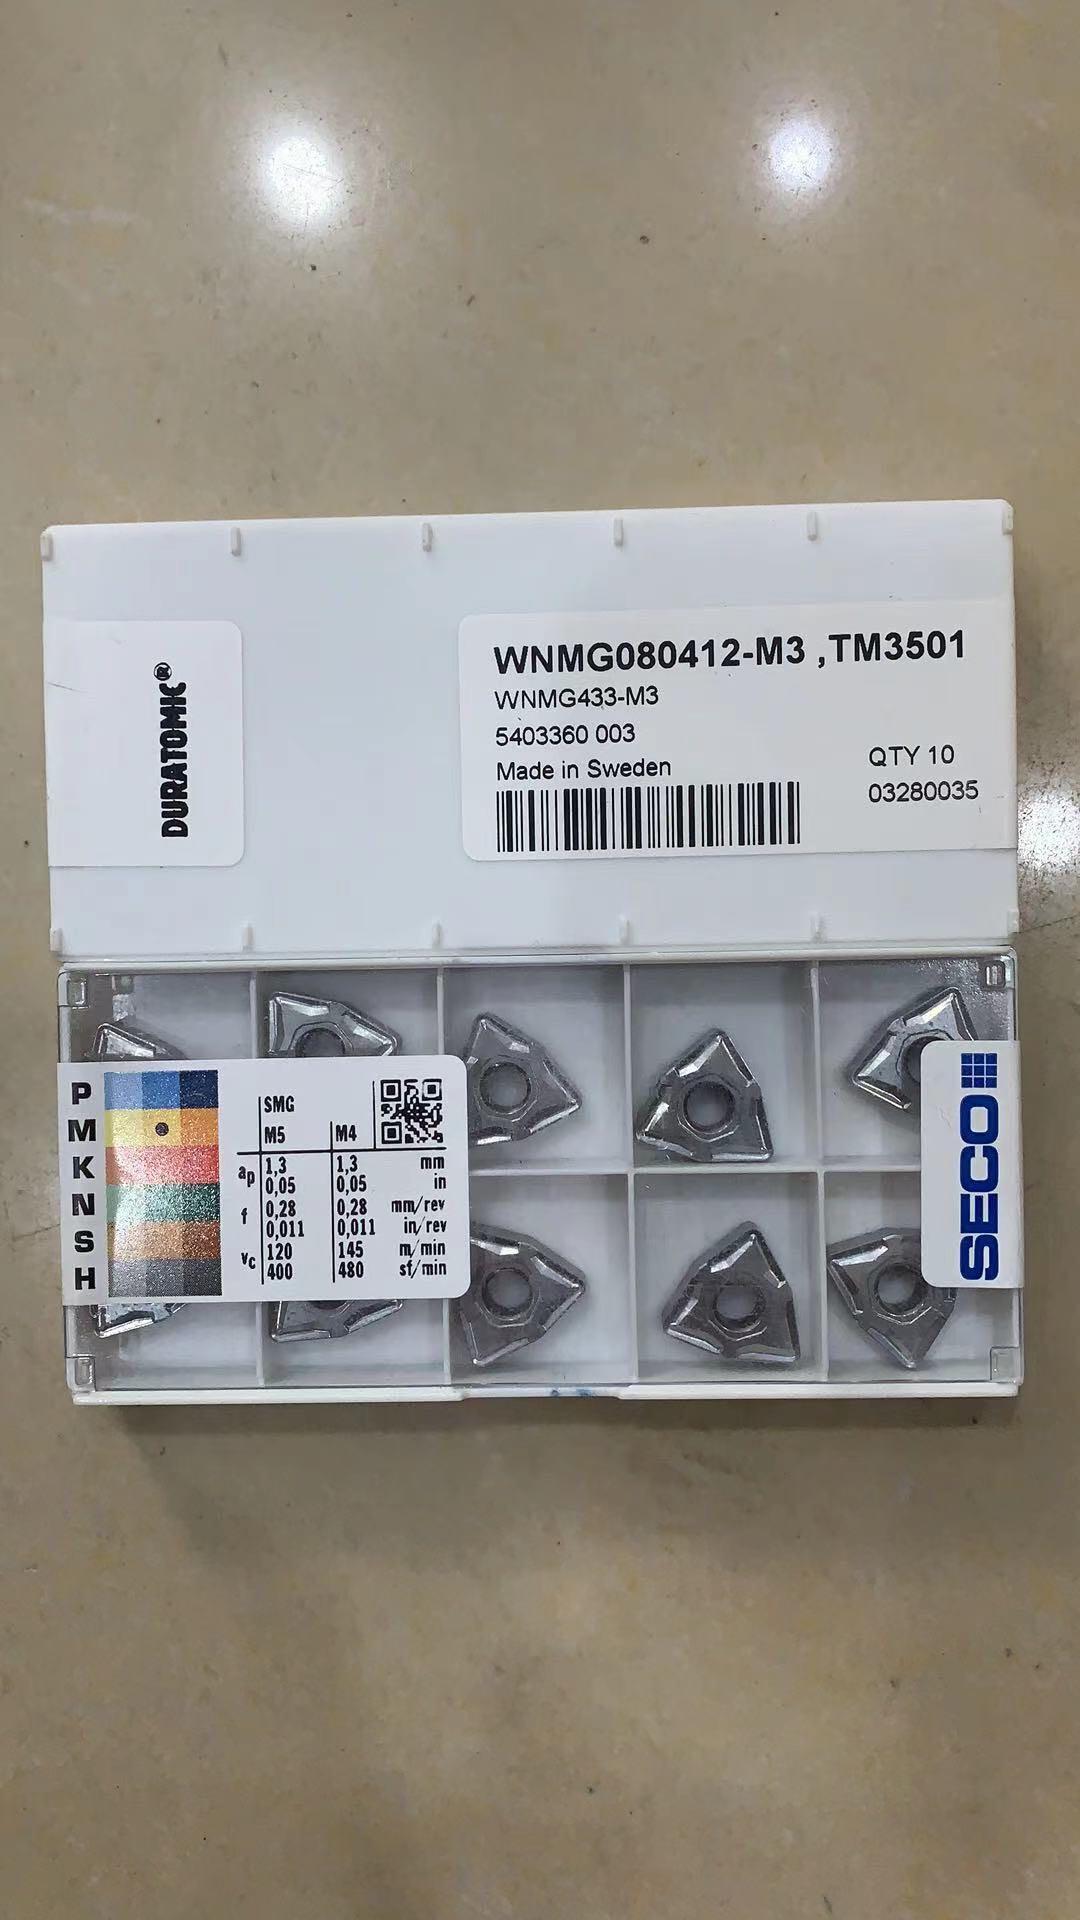 Seco cnc inser TNMG160408-MF3 tm3501/WNMG080404-MF3 tm3501/WNMG080408-MF3 tm3501/wnmg080412/torneamento de aço inoxidável